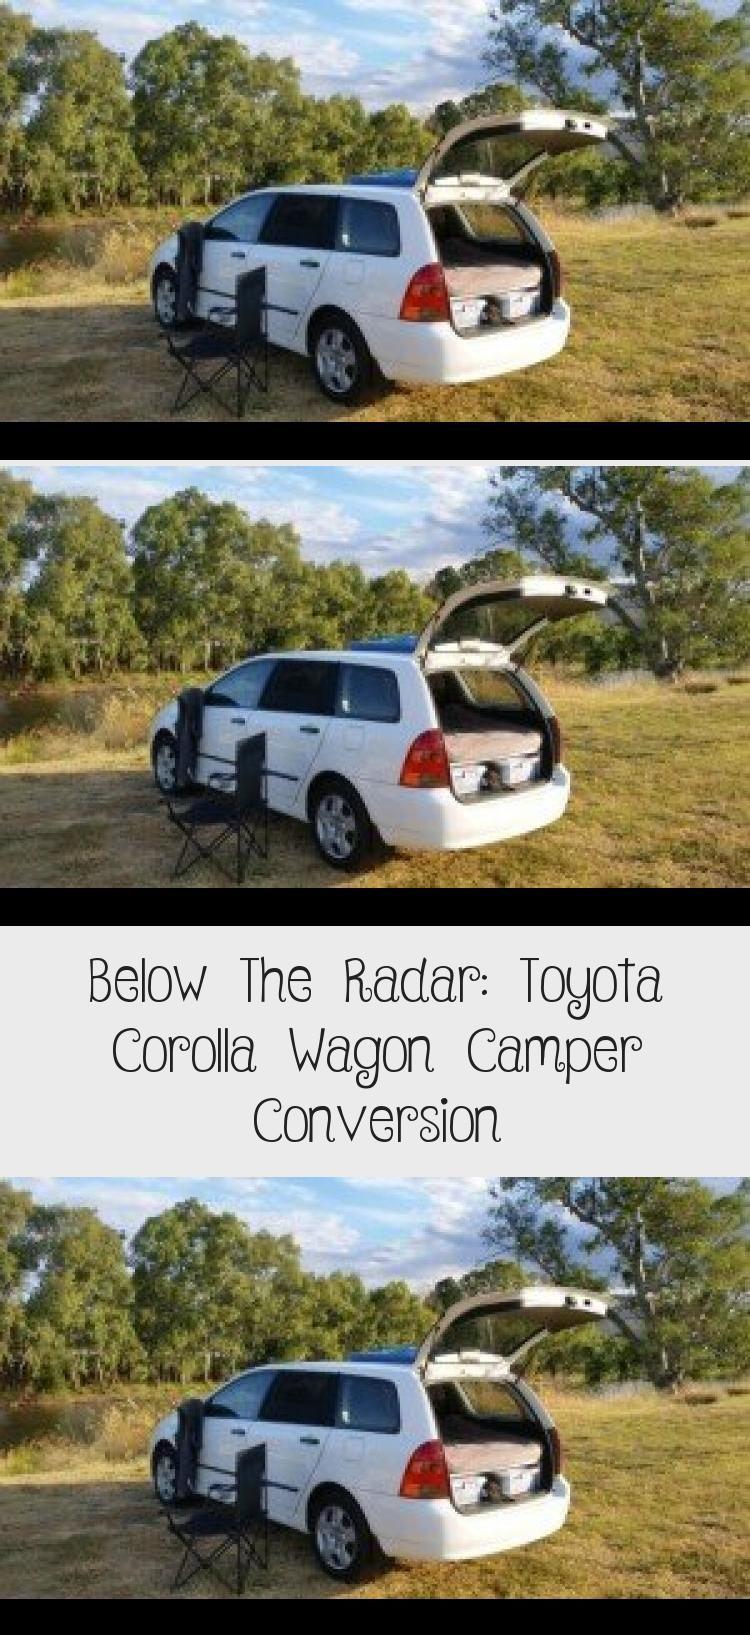 Below The Radar Toyota Corolla Wagon Camper Conversion In 2020 Corolla Wagon Toyota Corolla Camper Conversion